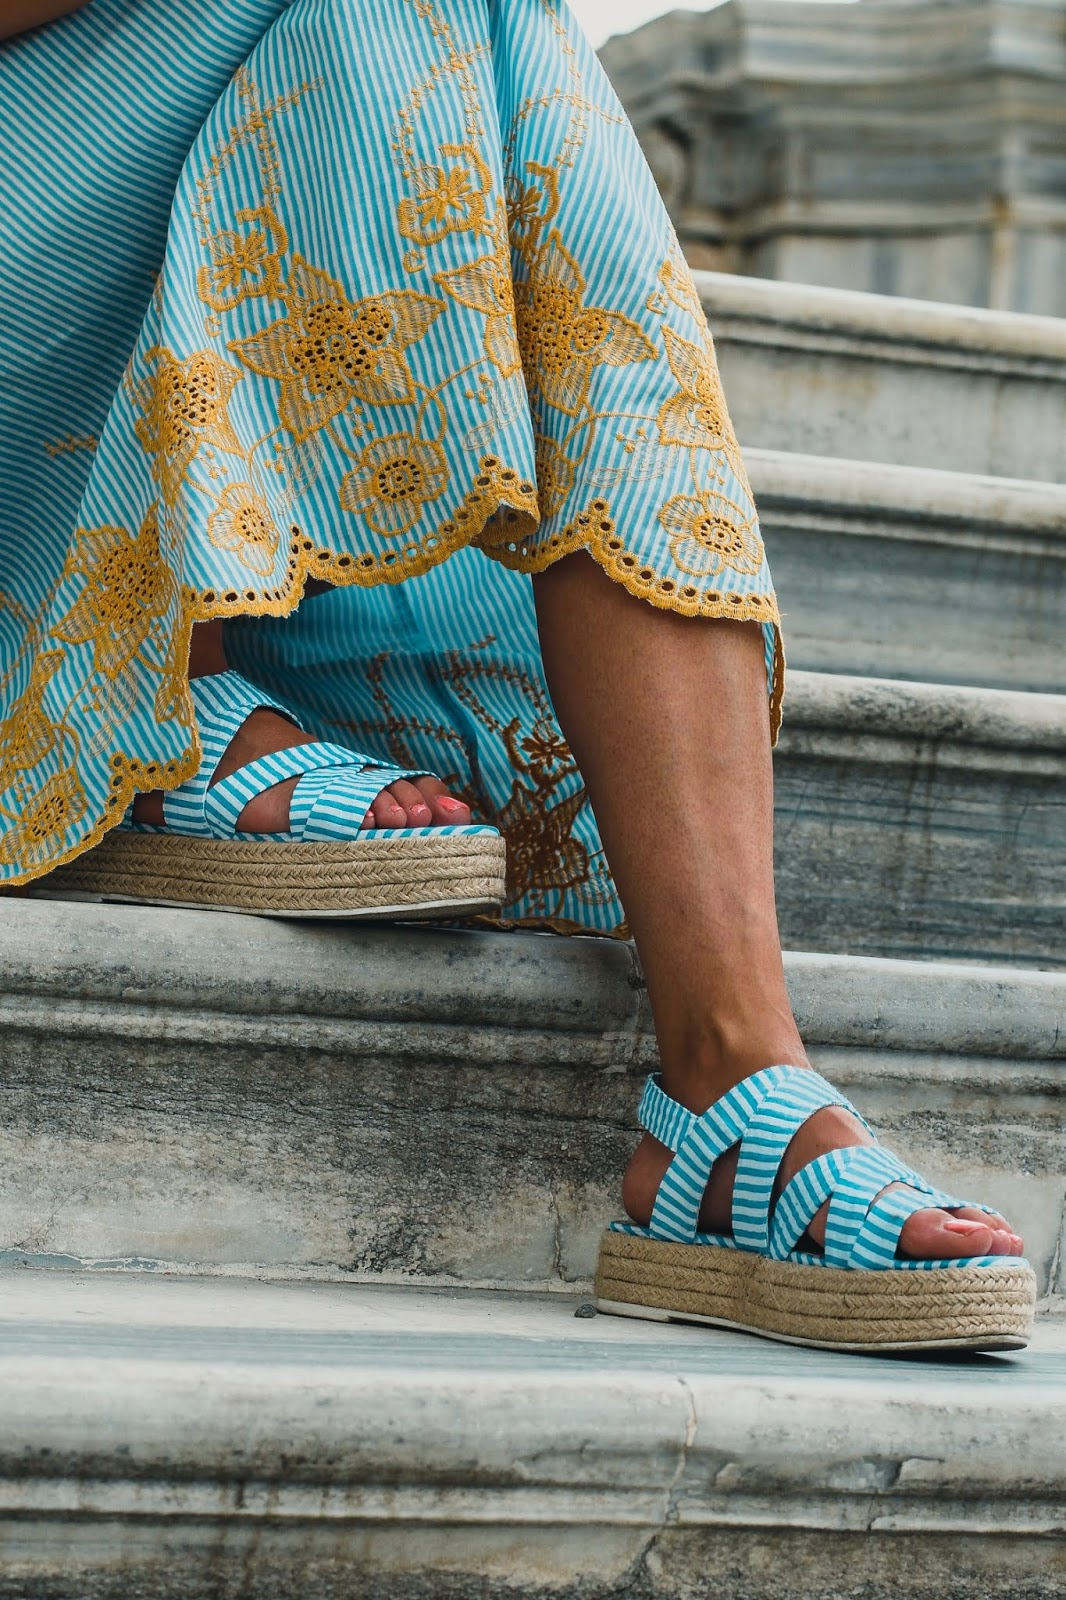 sandalias plataforma azules y blancas